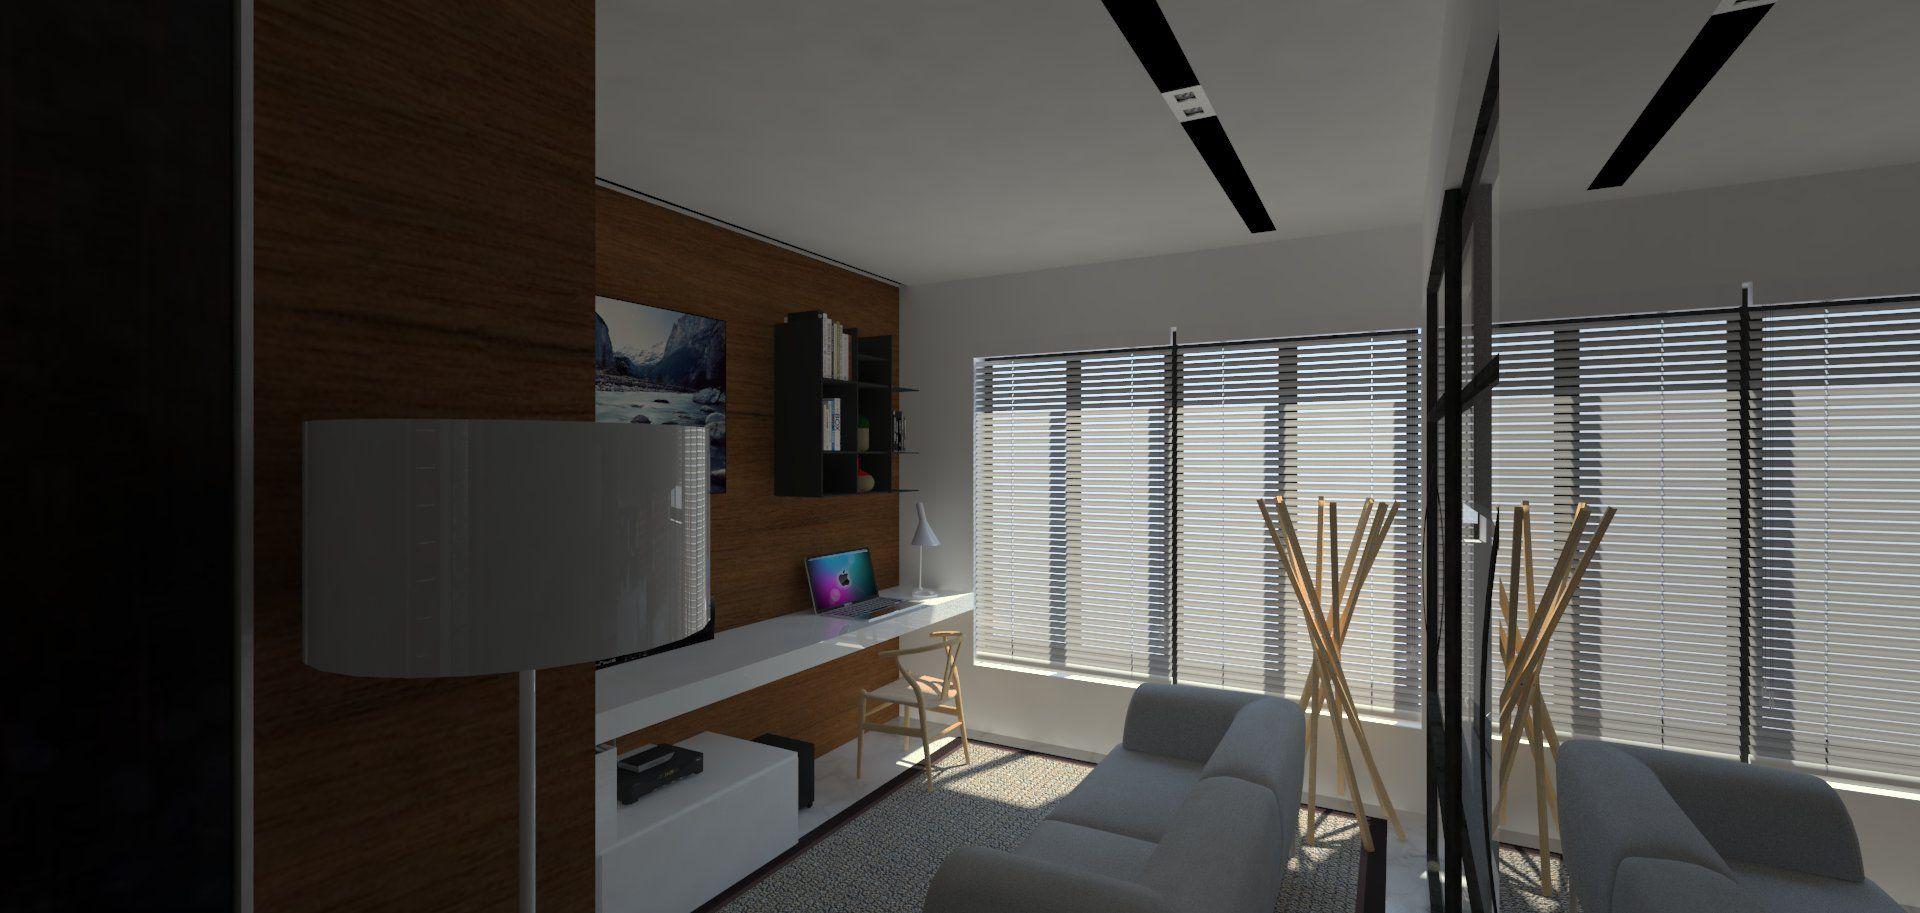 Hdb 2 Room Bto For Singles 47sqm Apartment Interior Design